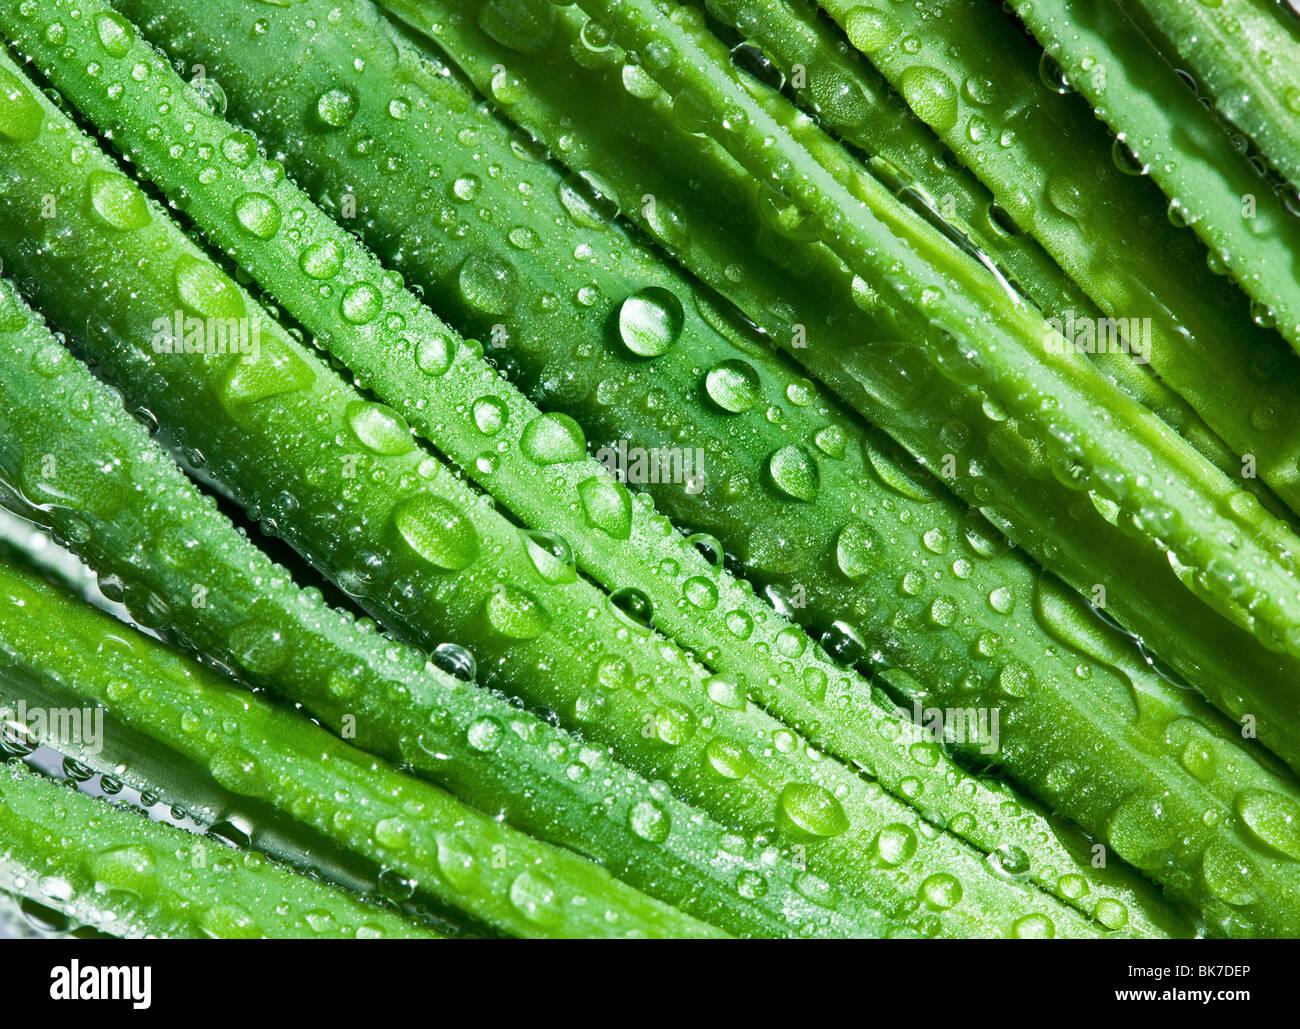 Hojas de cebolla closeup con gotas de agua Imagen De Stock